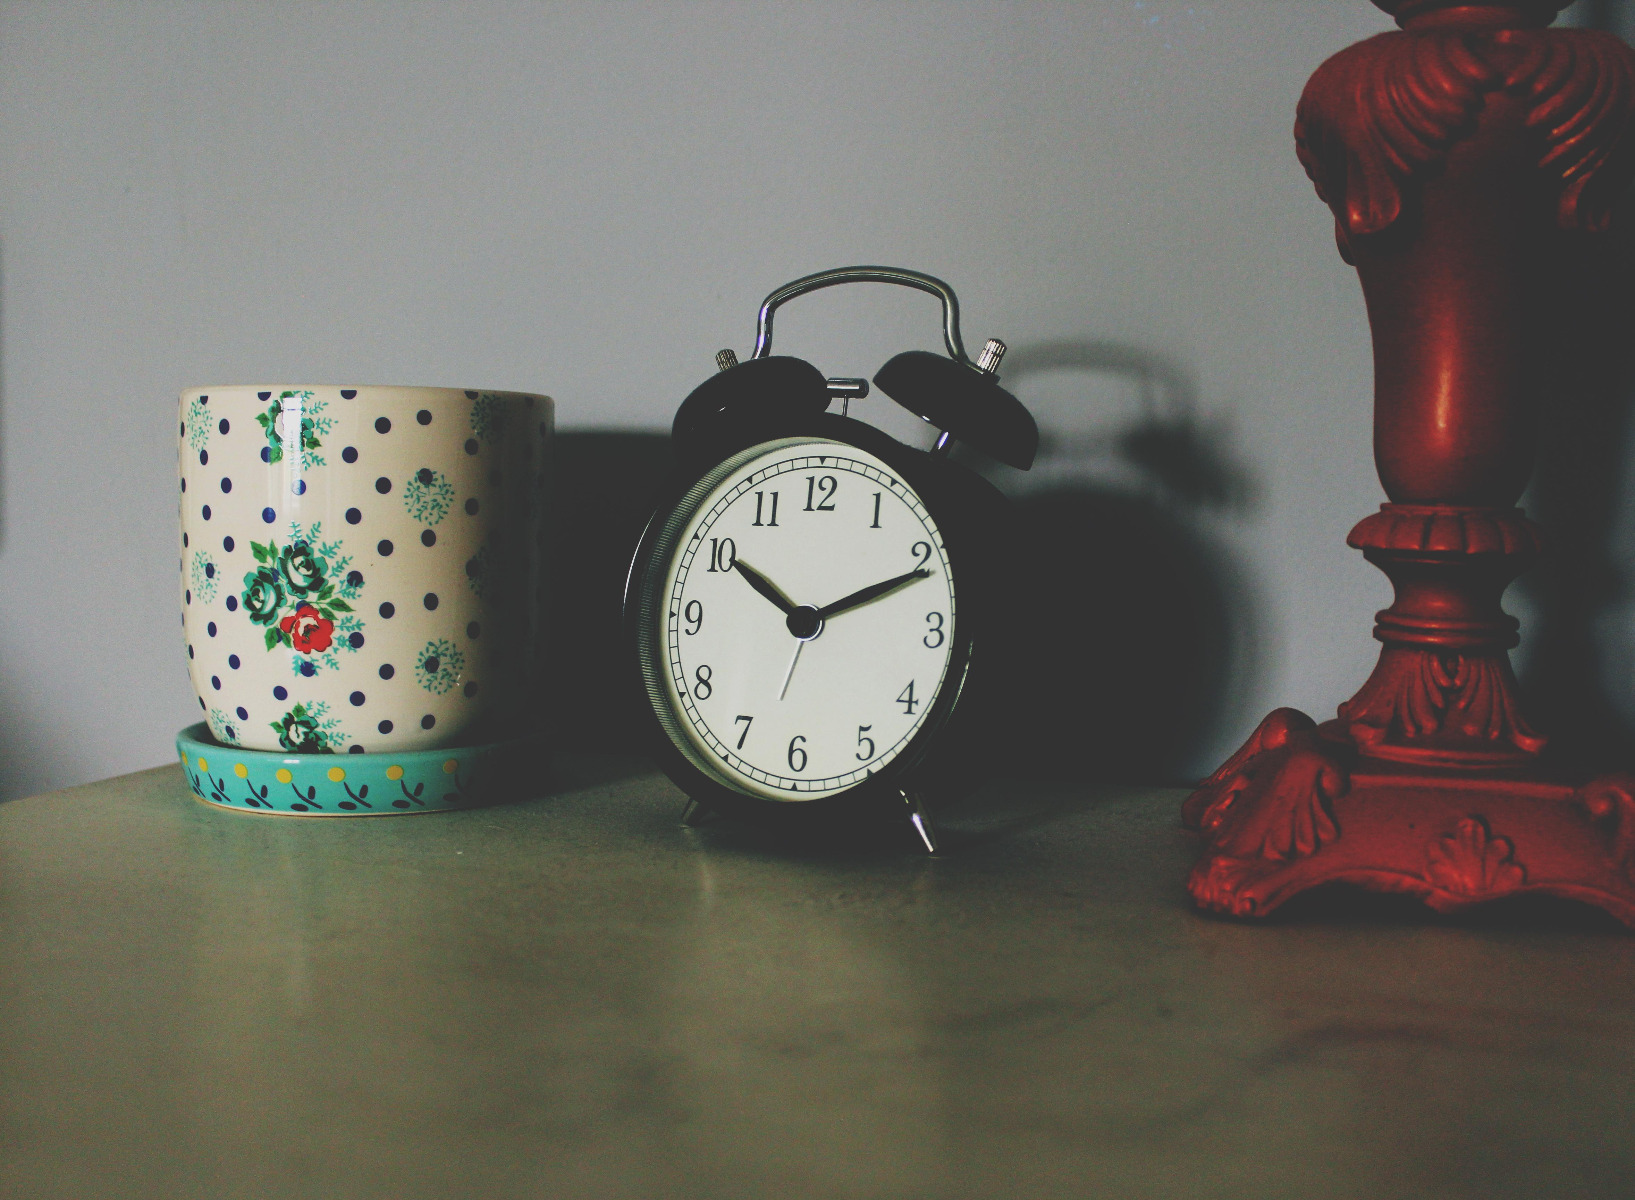 Mug and alarm clock